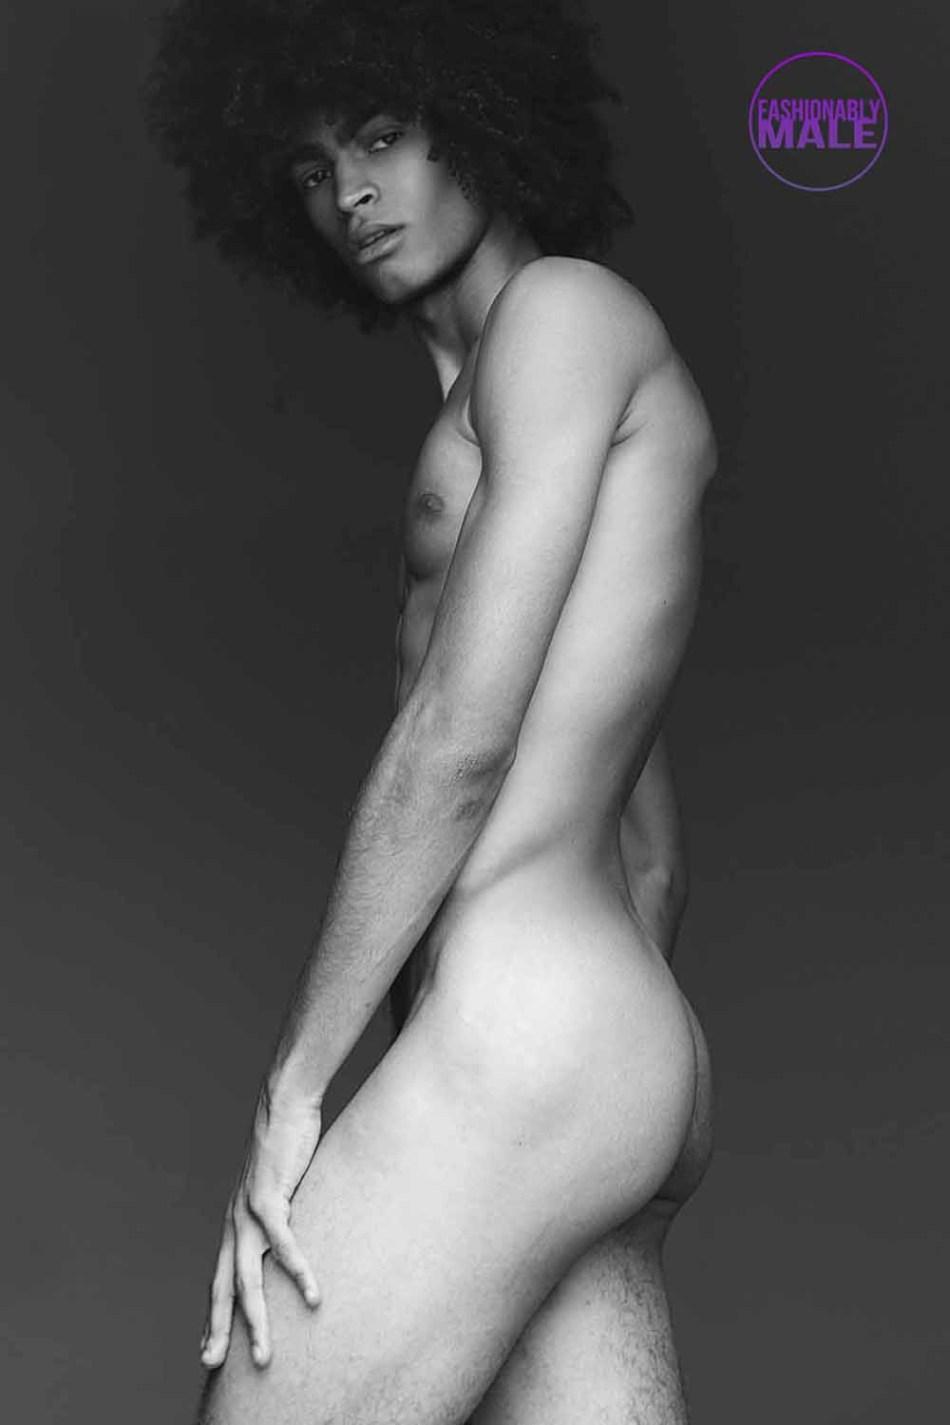 George - Soul of Ebony shots by Miguel Zaragozá